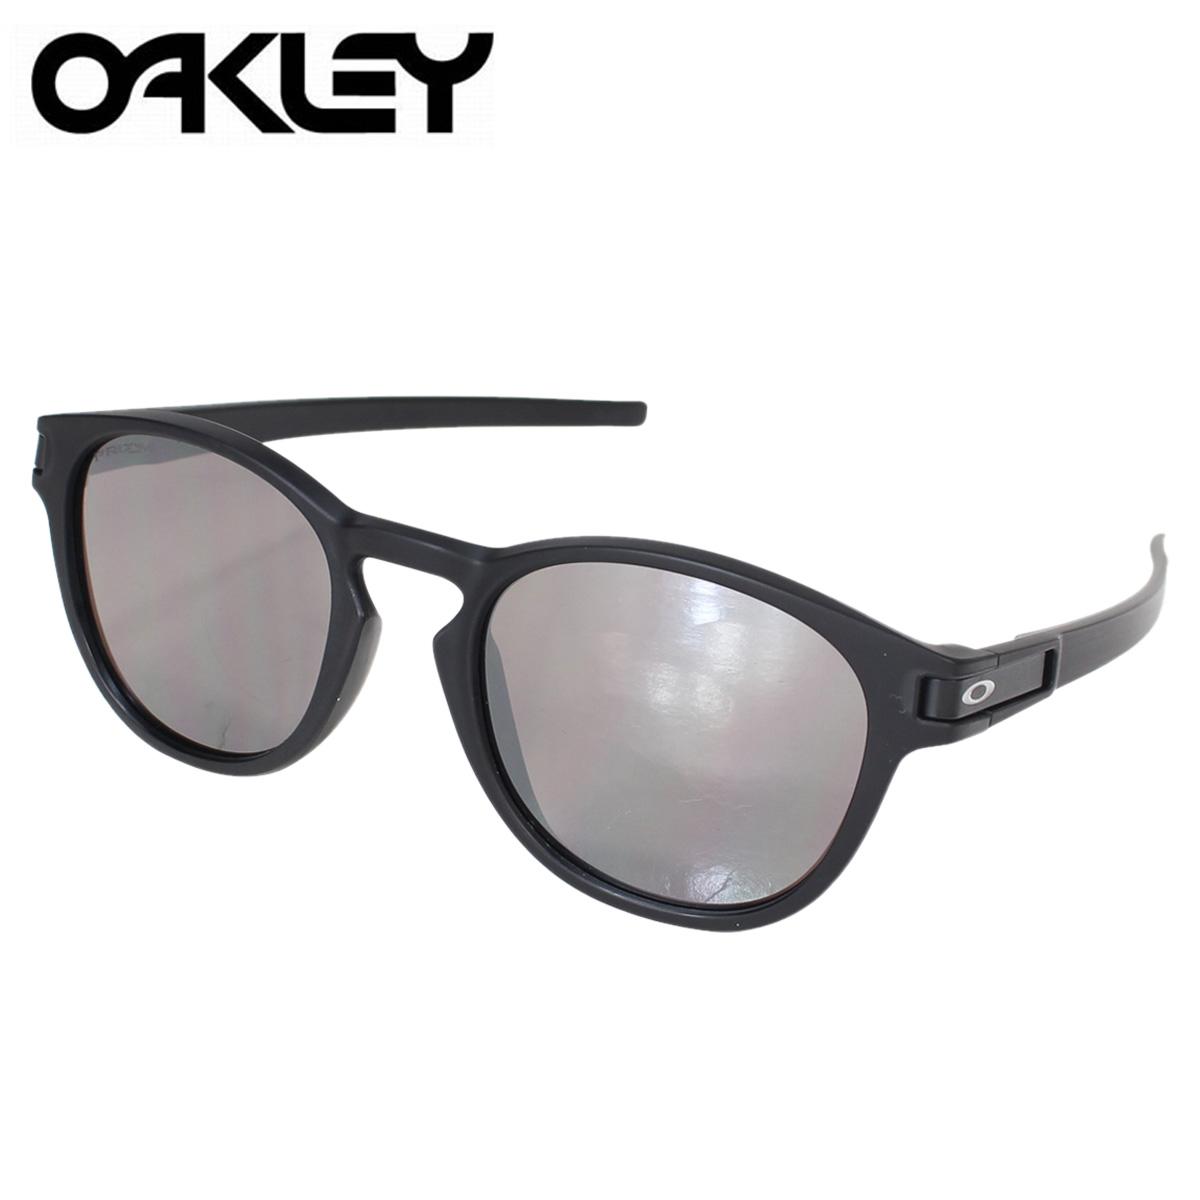 Oakley sunglasses latch horse mackerel Ann fitting Oakley LATCH ASIA FIT  OO9349-1153 black men gap Dis [9/7 Shinnyu load] [179]